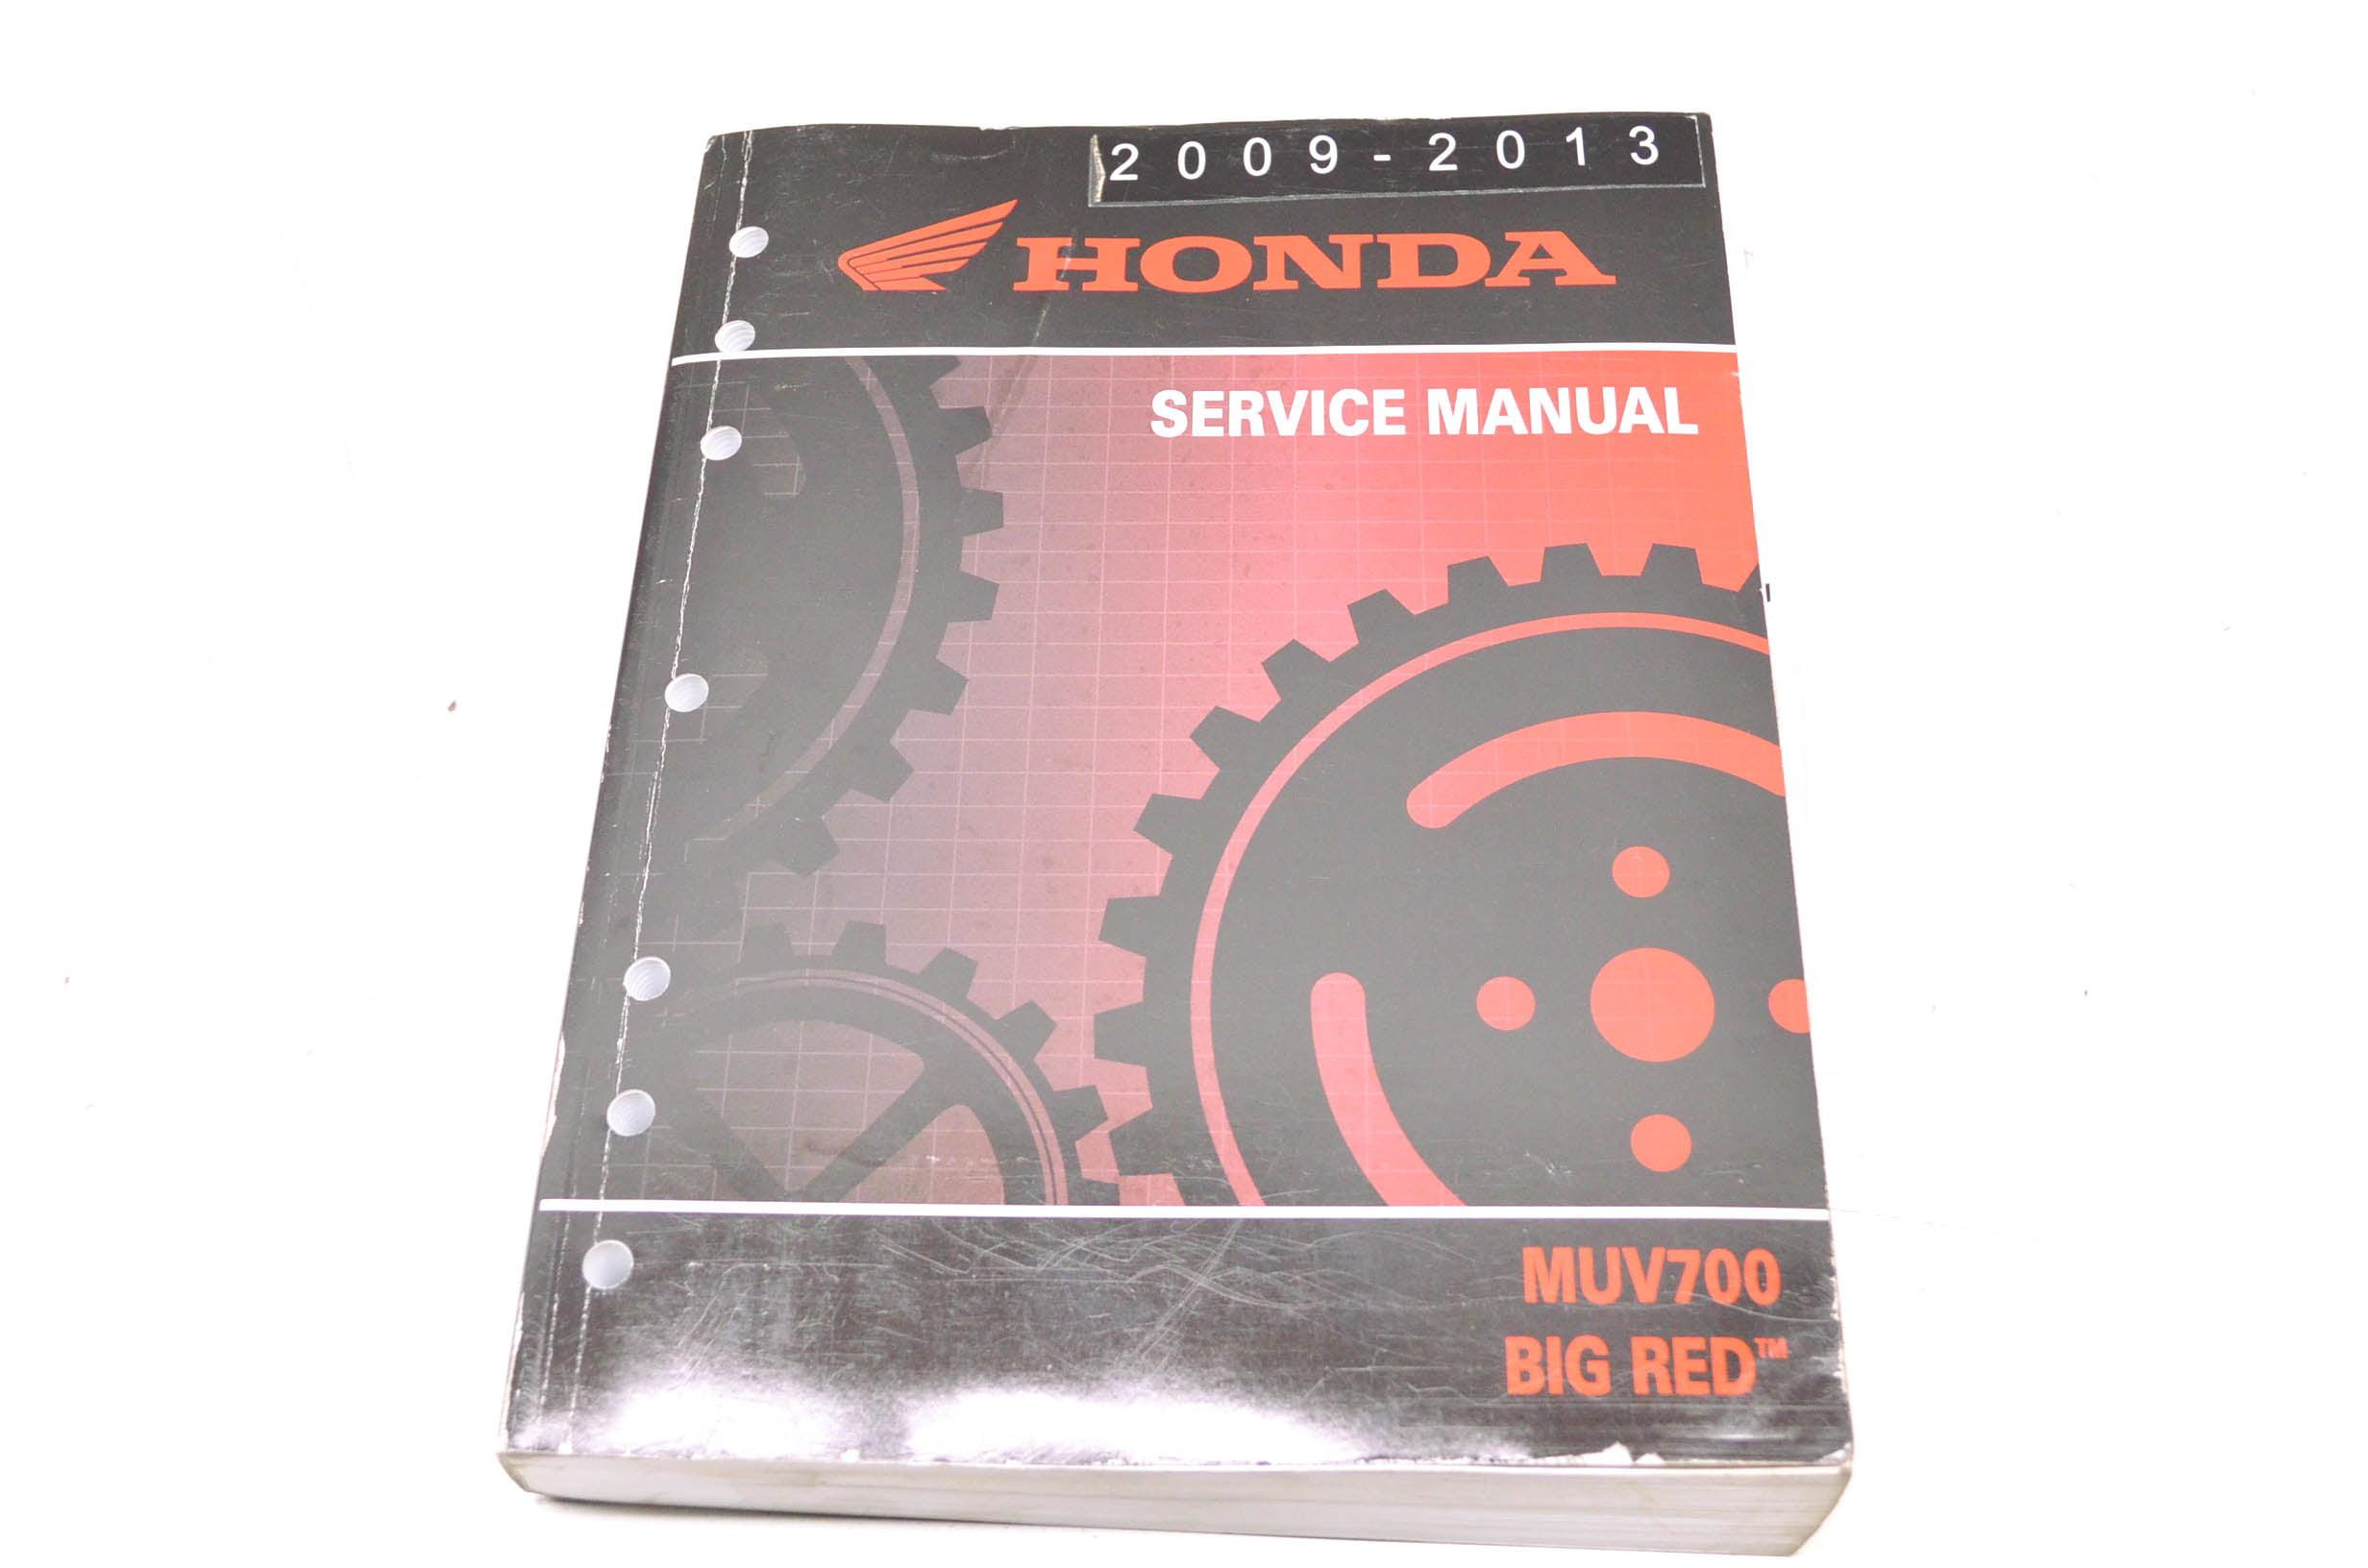 Honda 61HL104 2009-2013 MUV700 Big Red Service Manual QTY 1 - Walmart.com